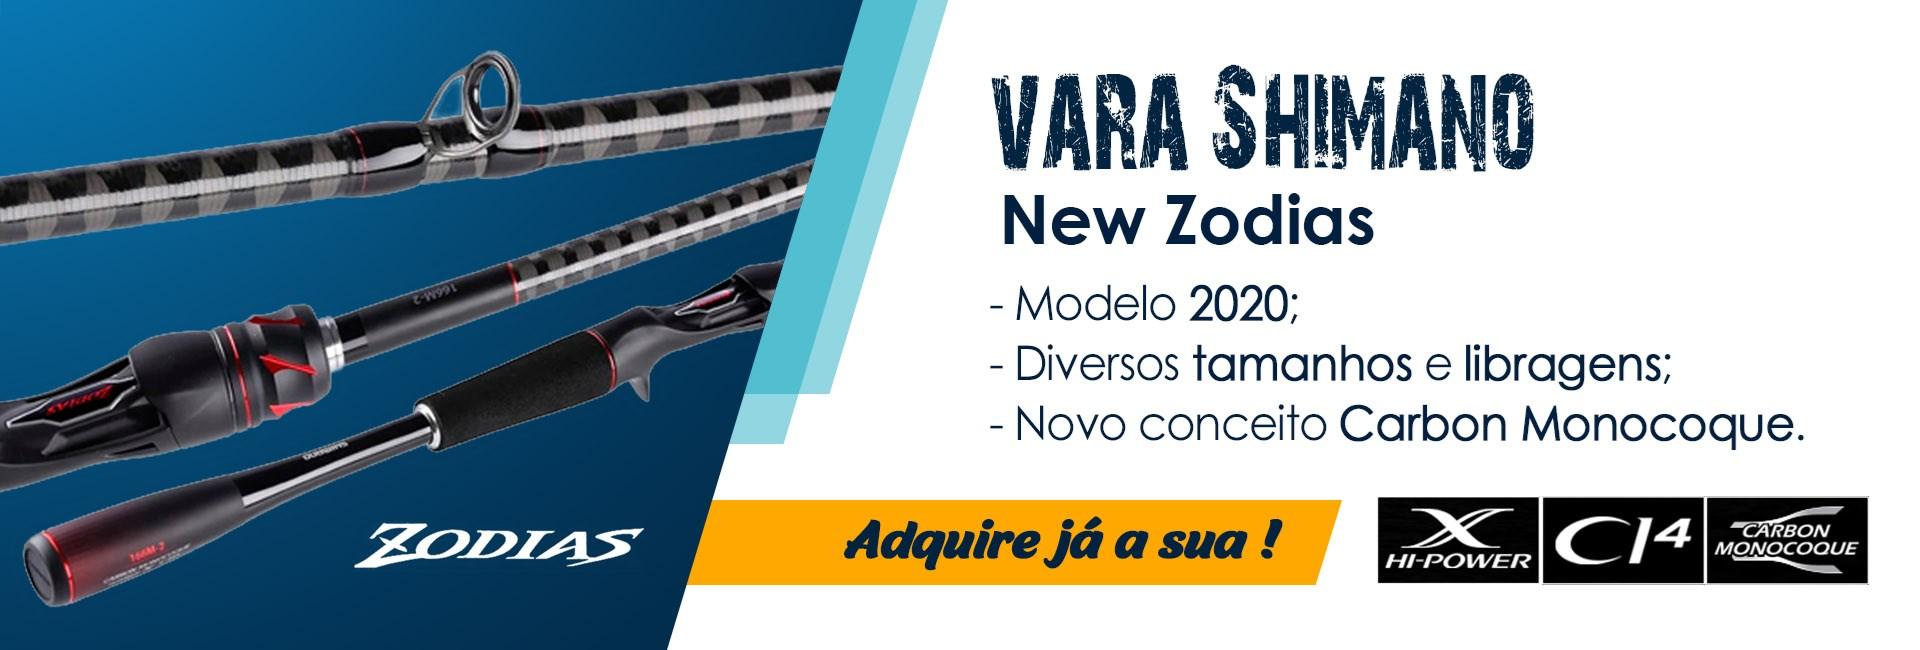 New Zodias 2020